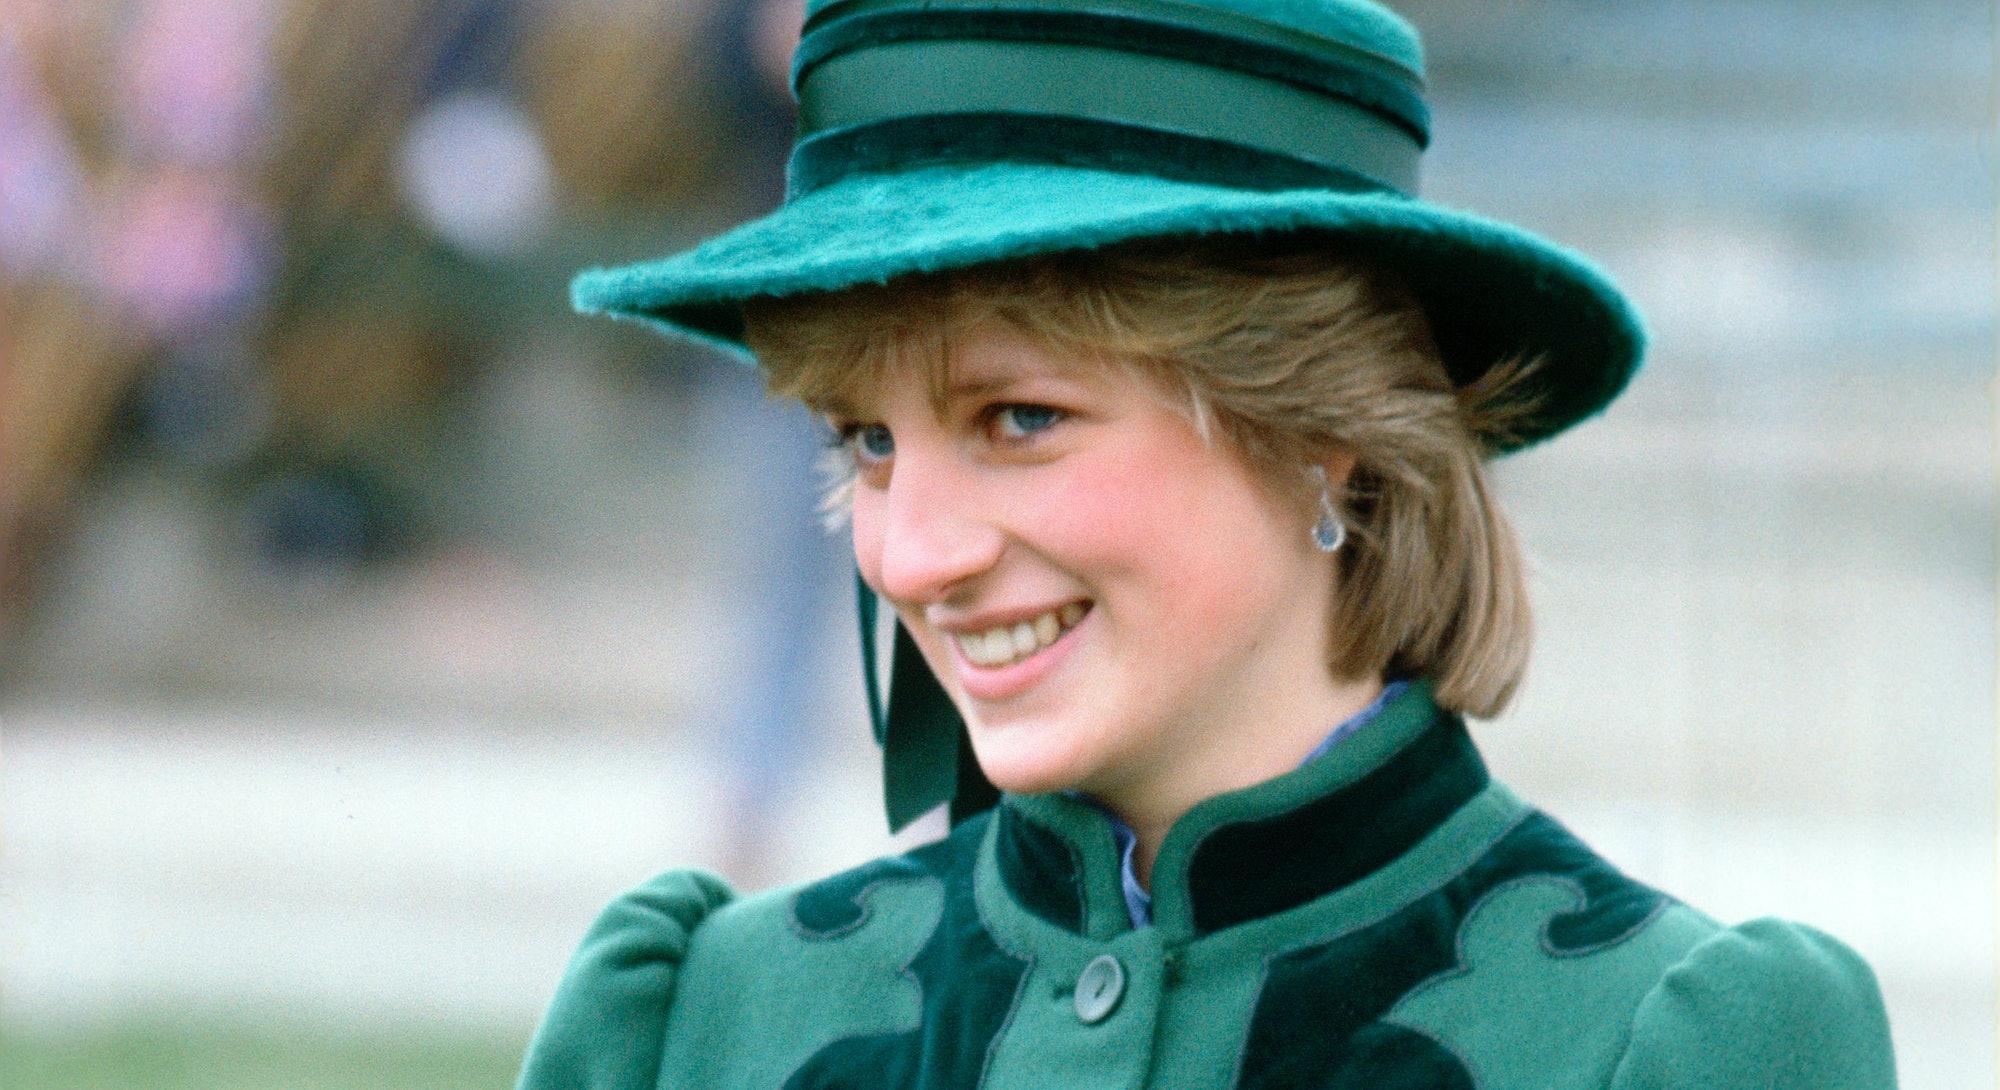 Princess diana in a green maternity coat